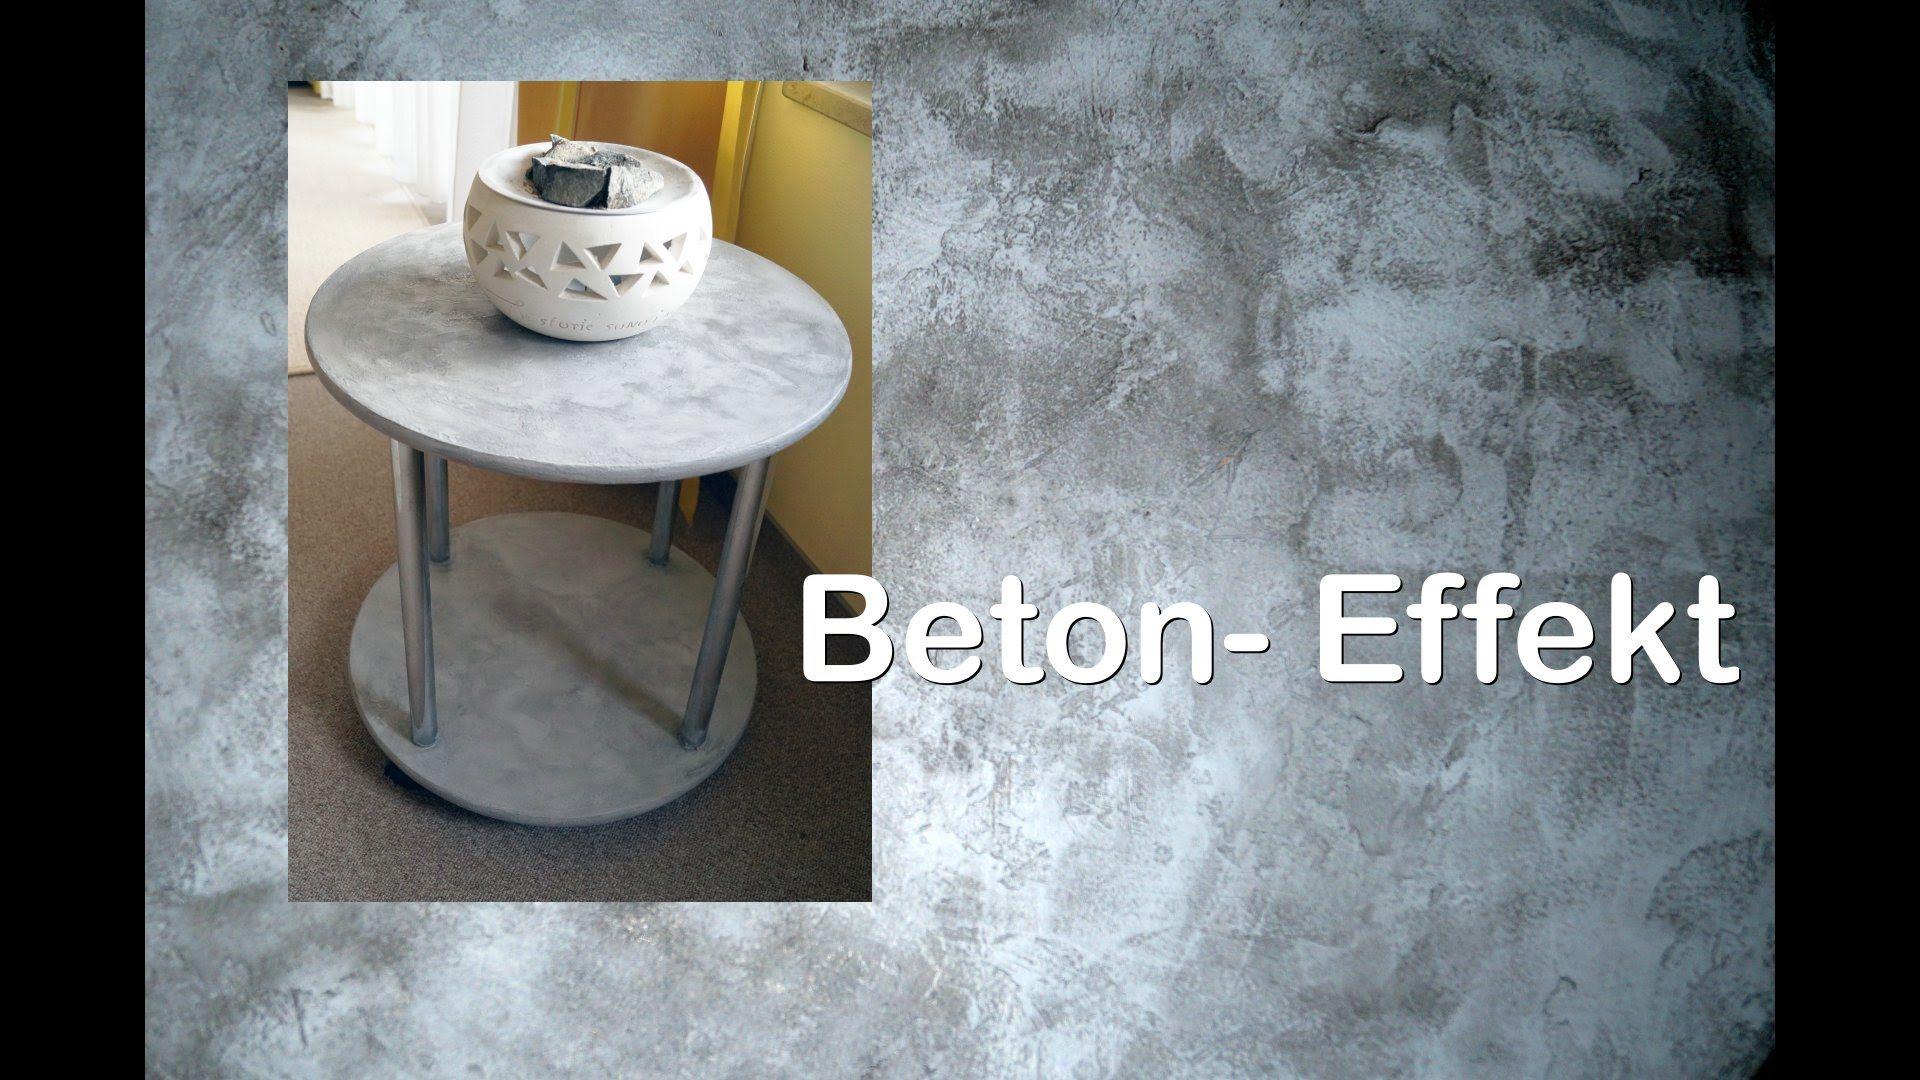 beton effekt paste ruthvg ruth s kreativideen. Black Bedroom Furniture Sets. Home Design Ideas